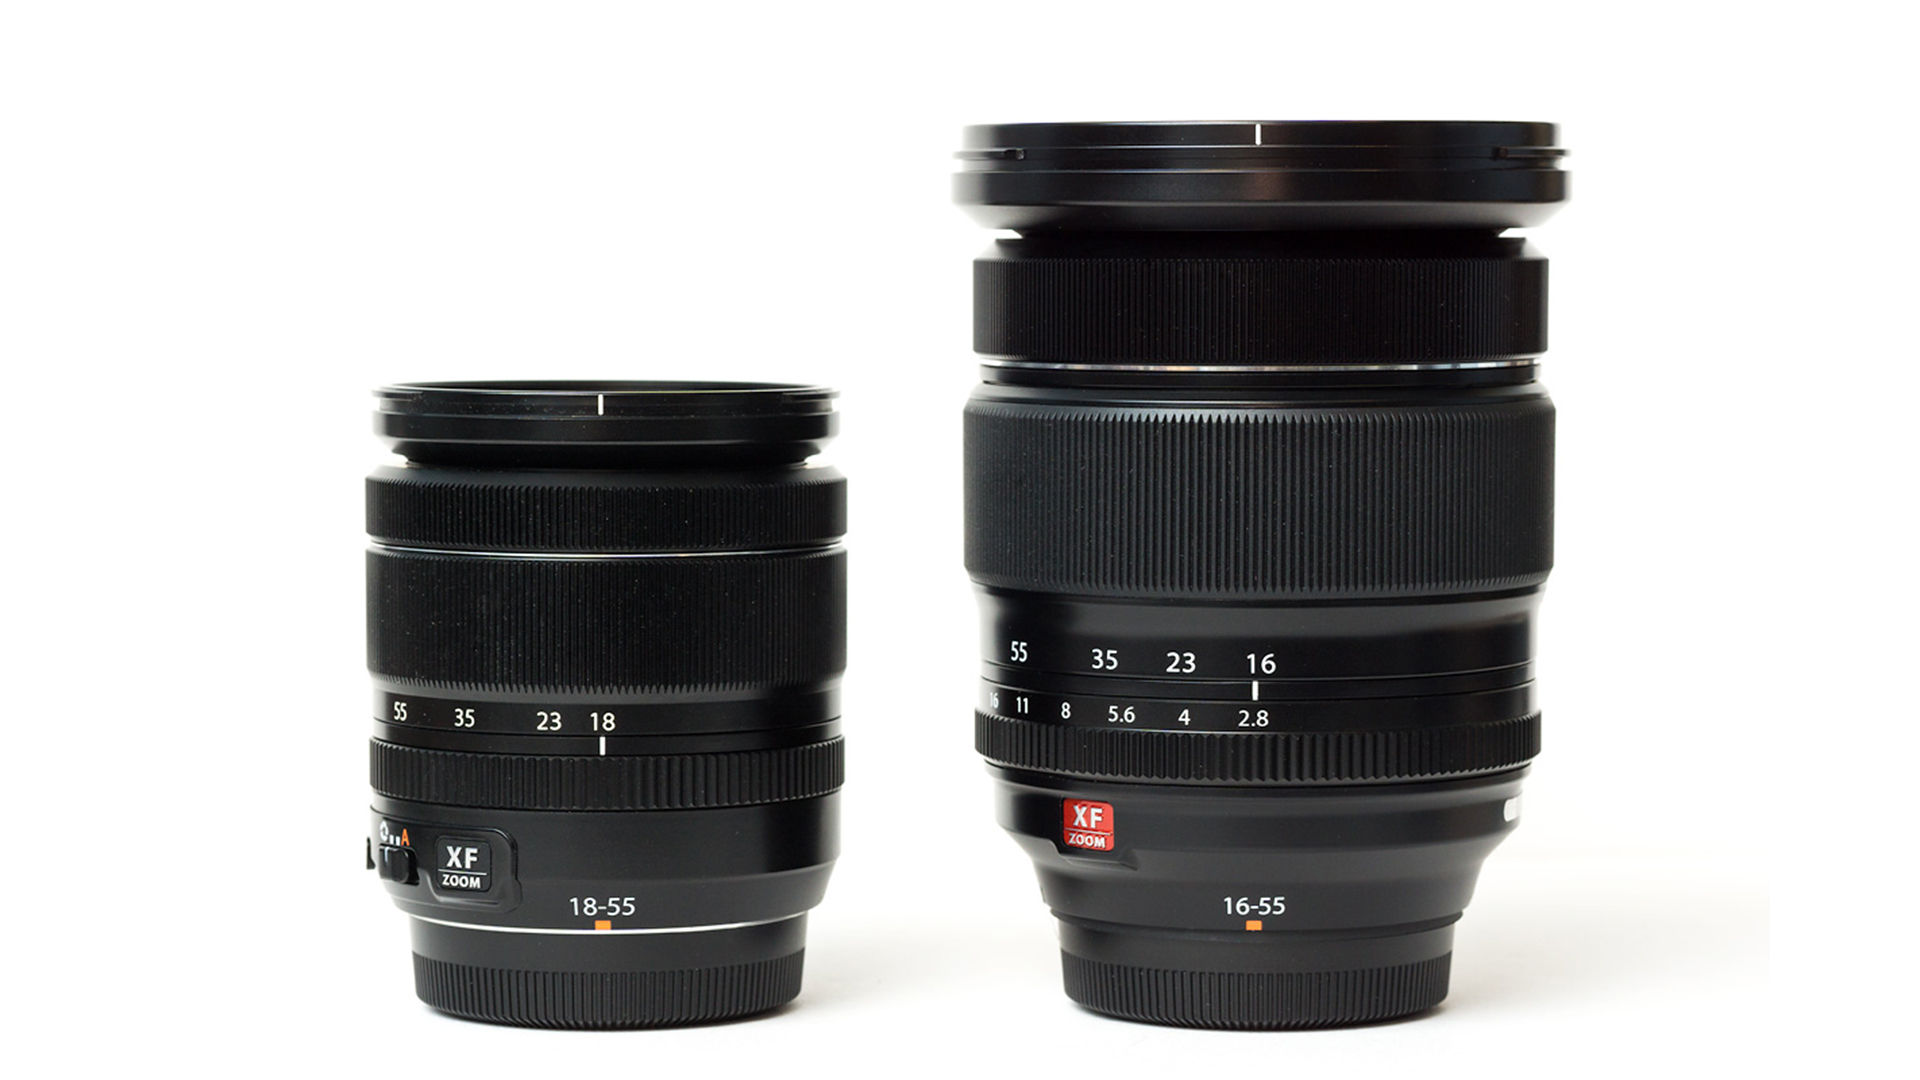 Fuji's Mid Range Zooms - Fujinon 18-55mm VS Fujinon 16-55mm